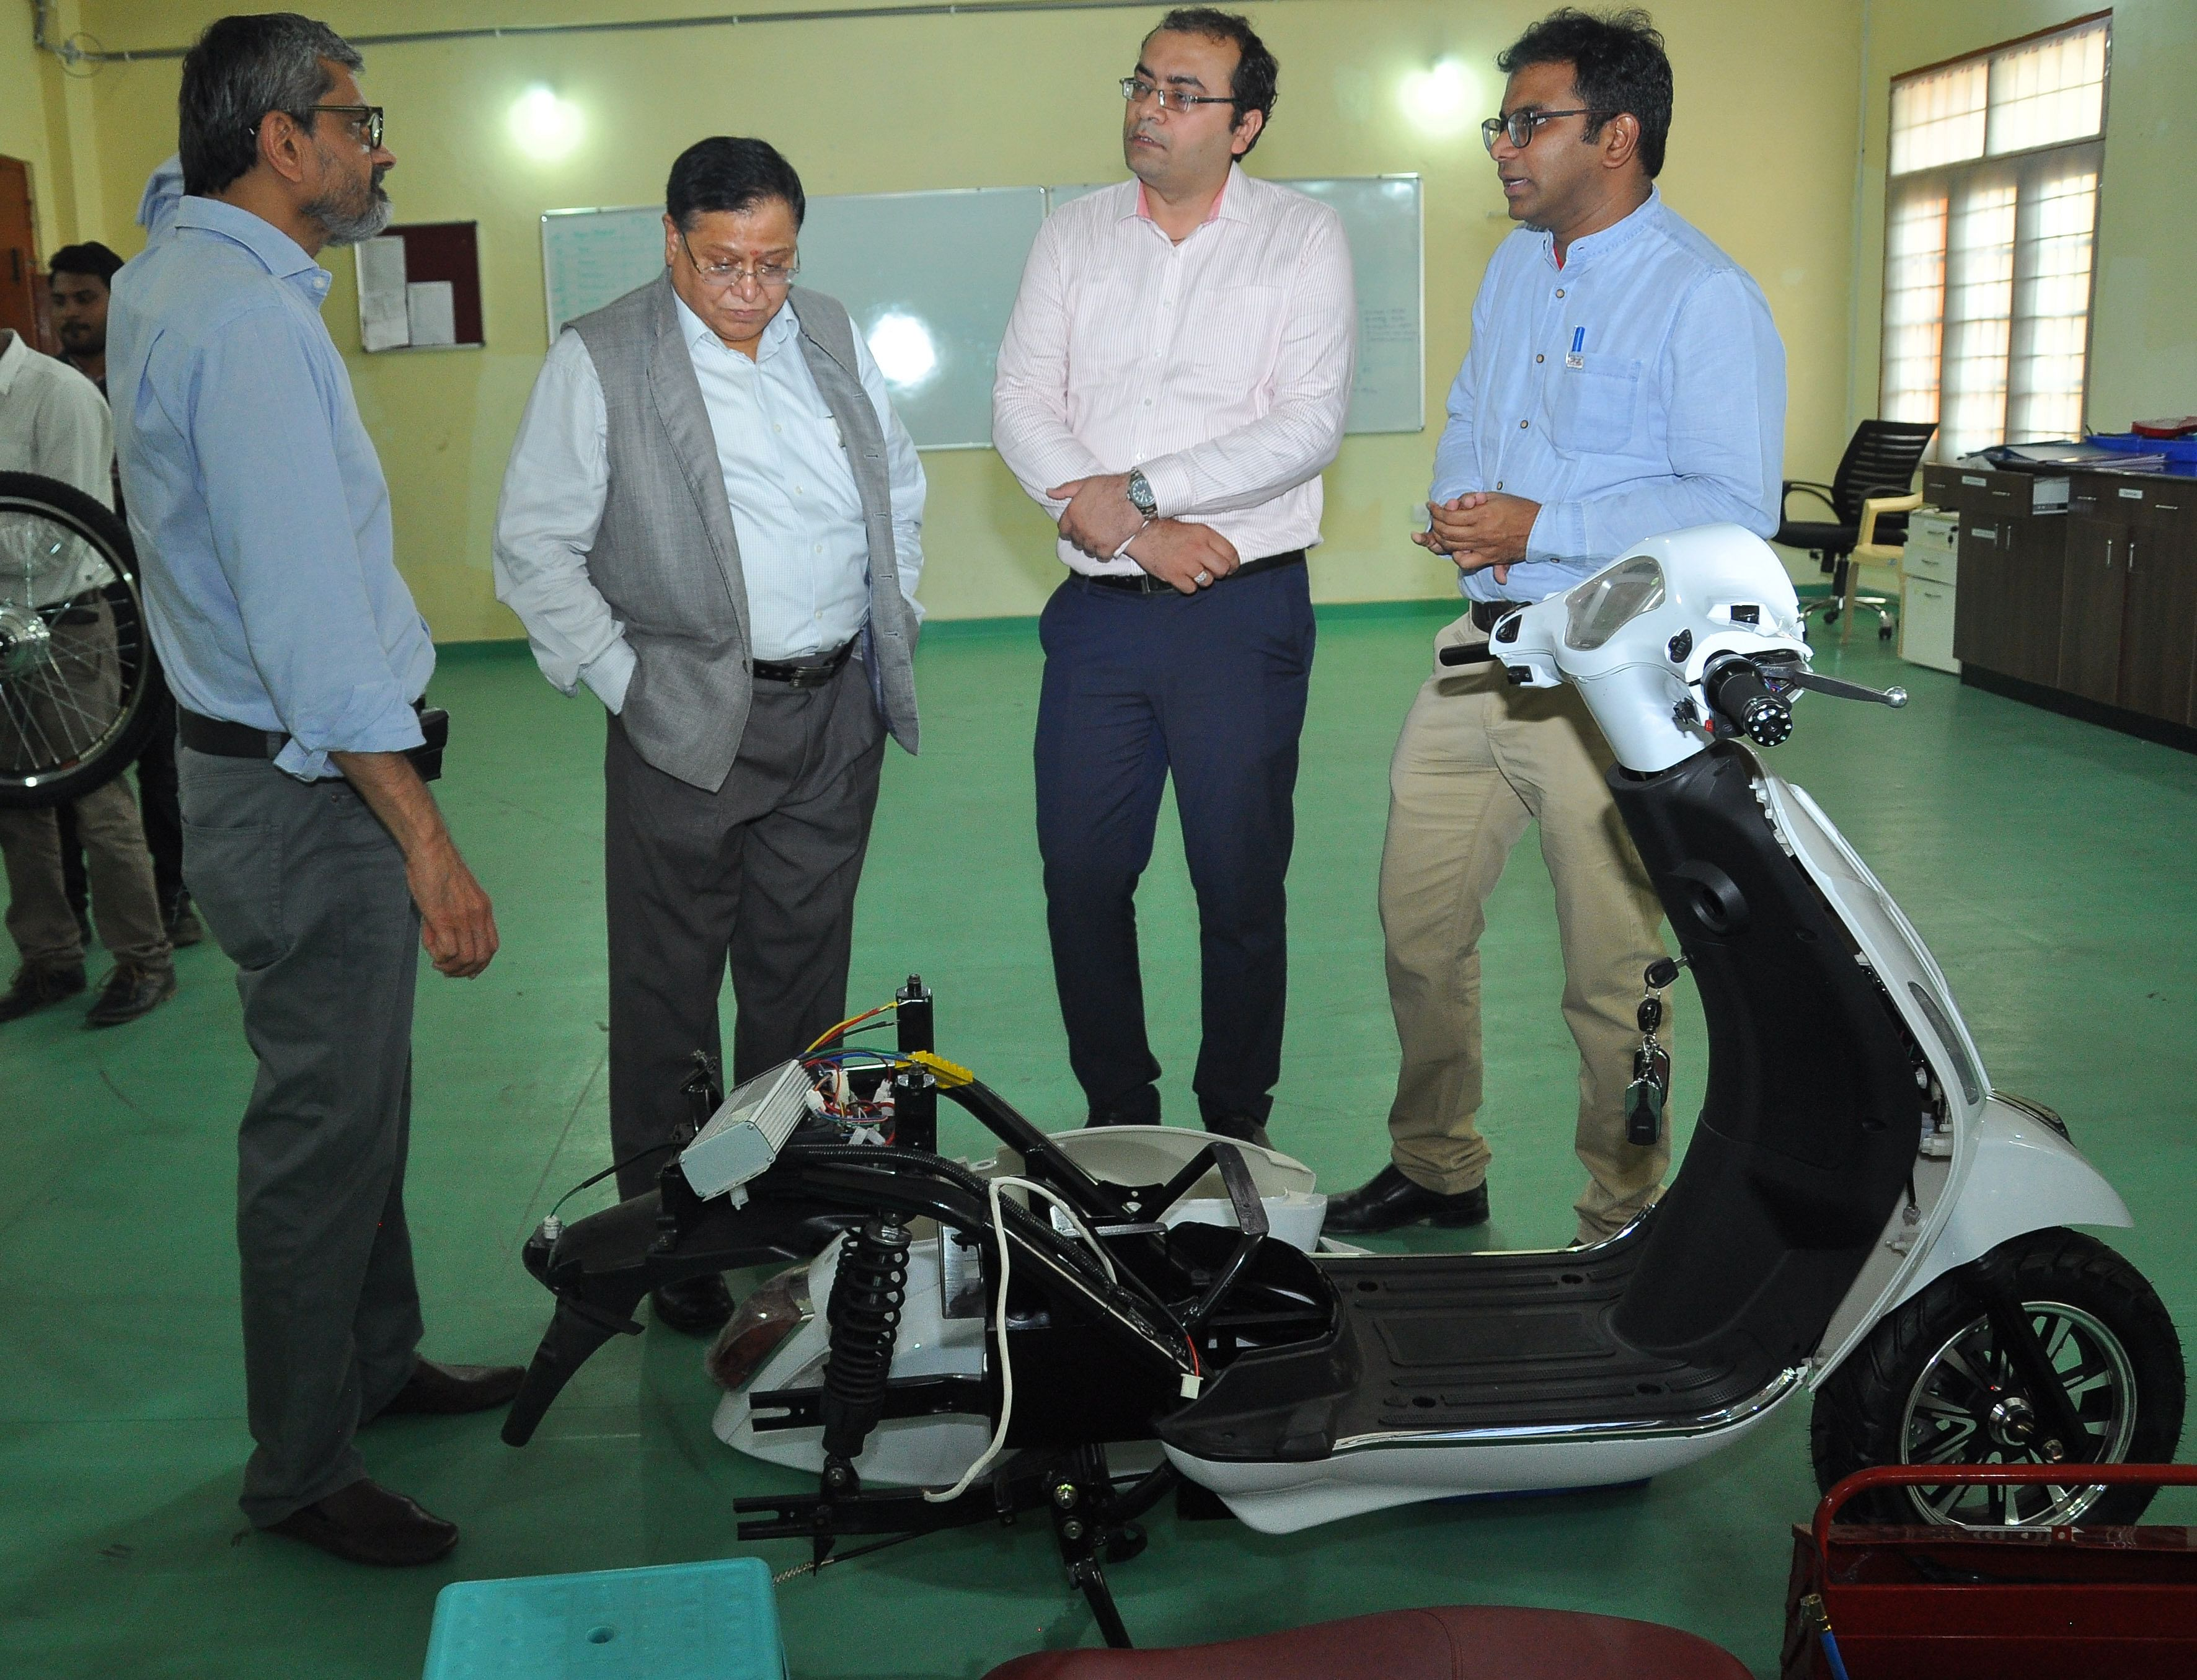 (L_R) Prof U.B. Desai, Director, IIT Hyderabad, Dr. V.K. Saraswat, Member, NITI Aayog, Mr. Rohit Vadera, CEO, PURE EV, and Dr. Nishanth Dongari, Assistant Professor, IITH.